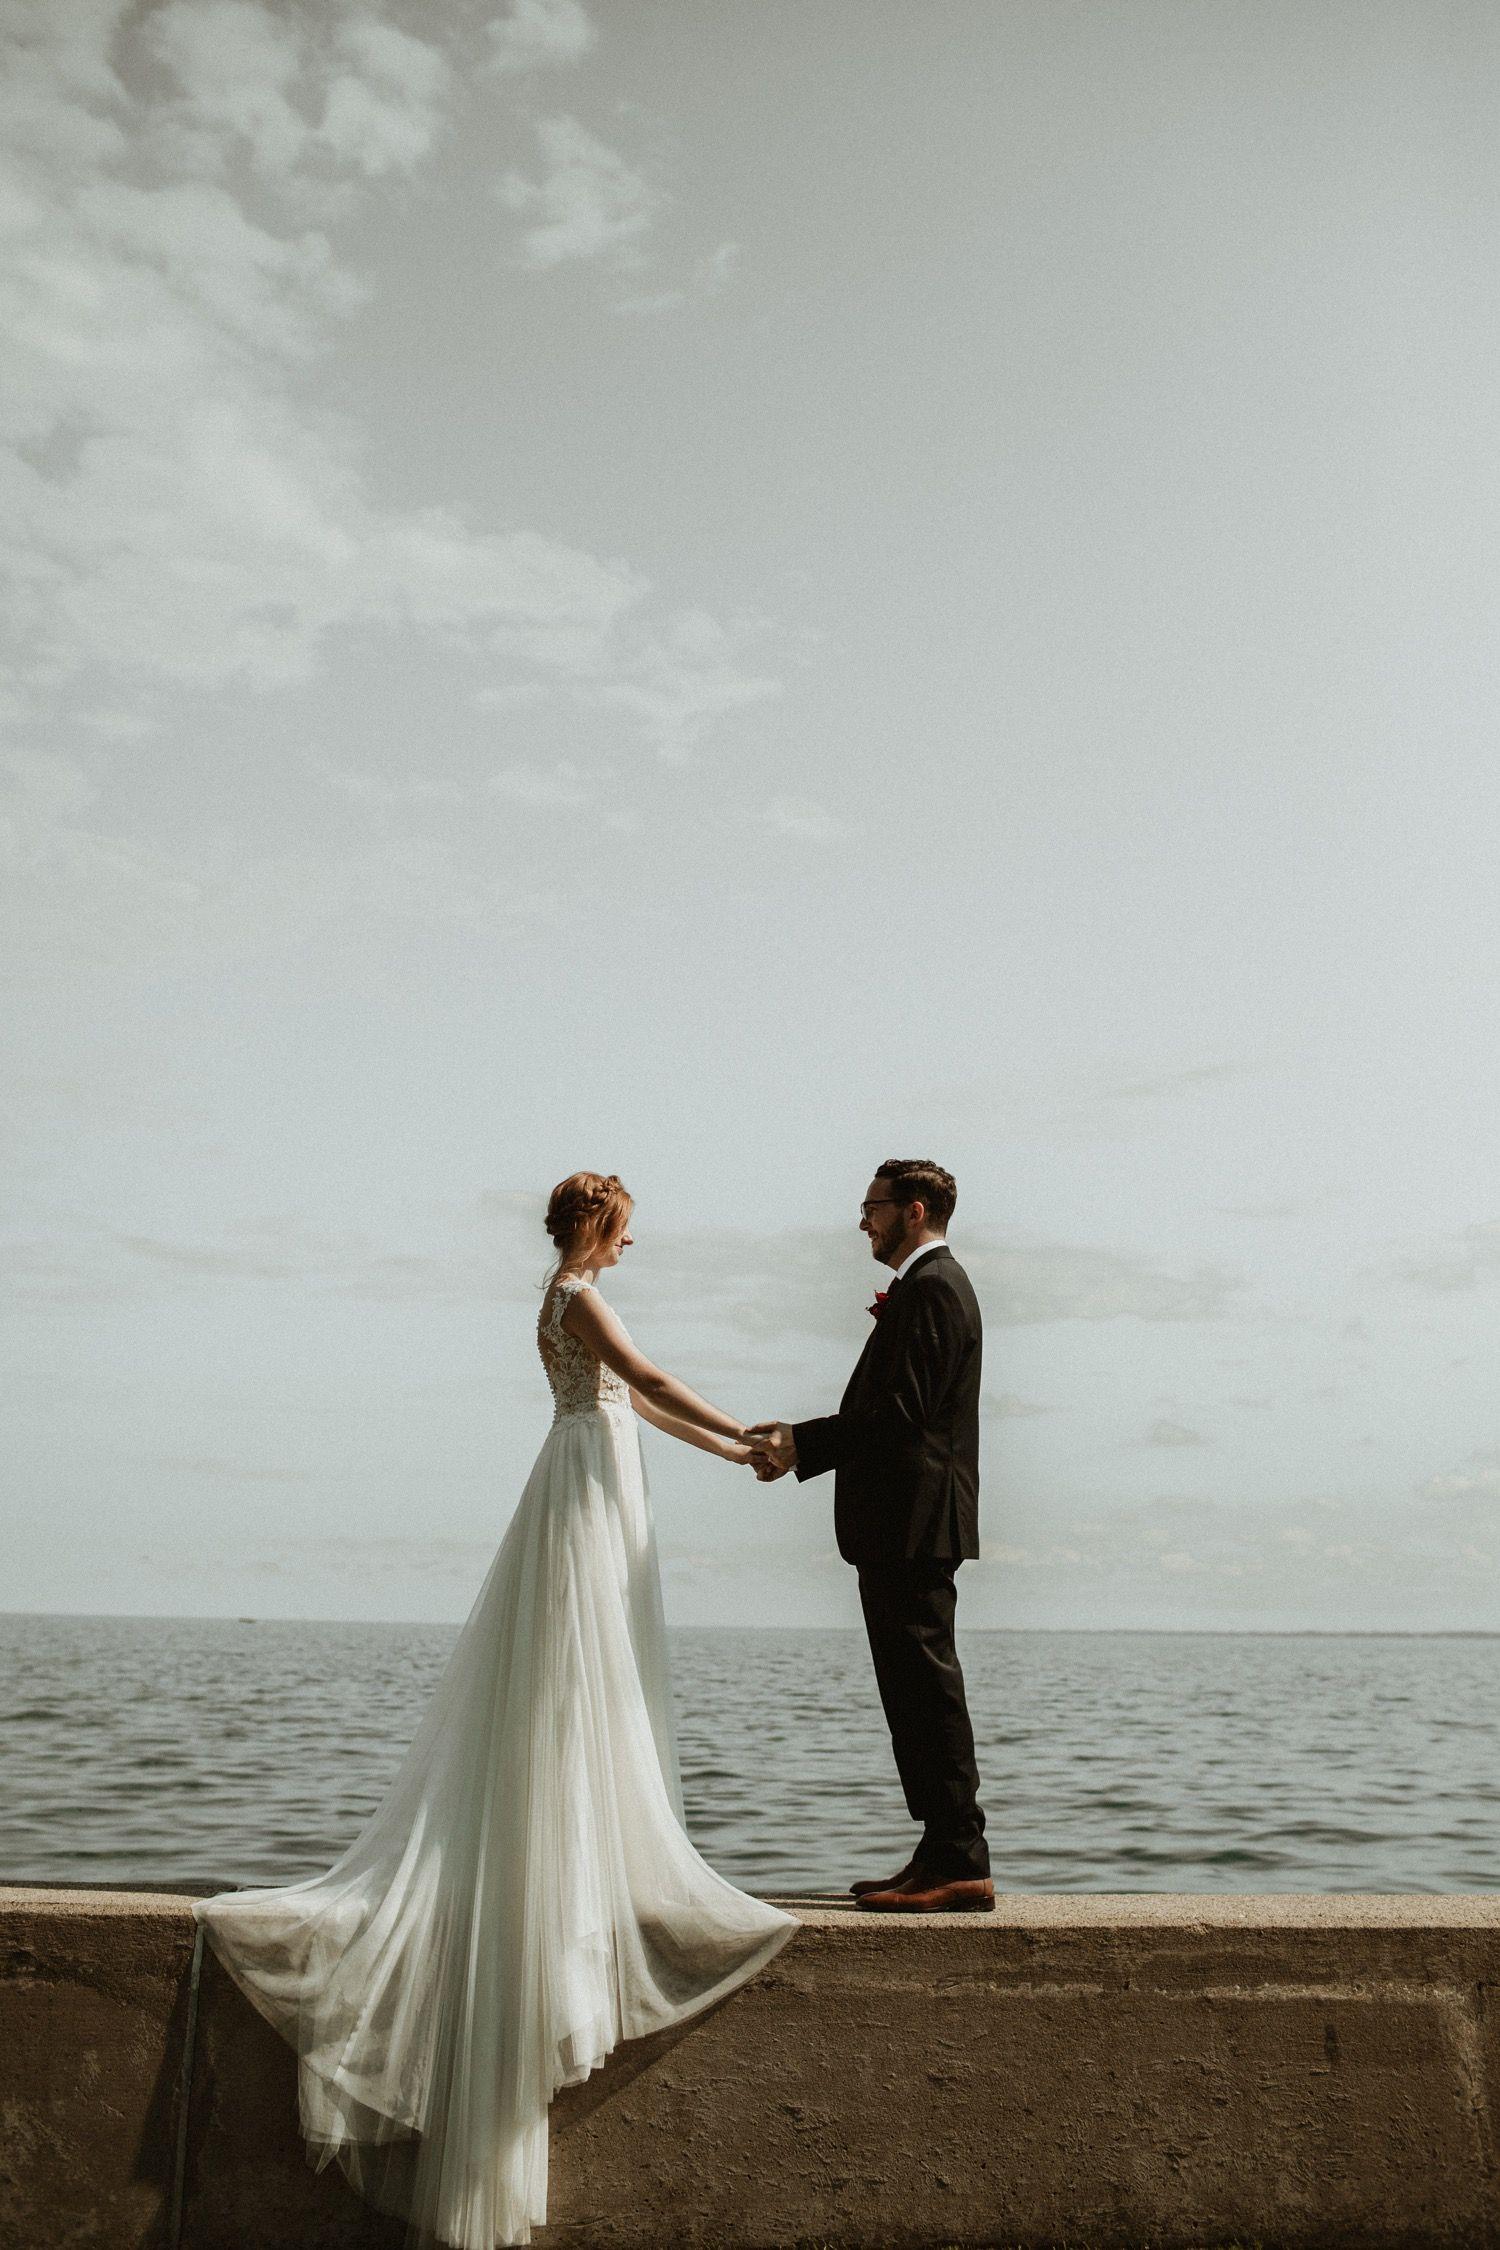 On the water Michigan wedding in 2020 Michigan wedding